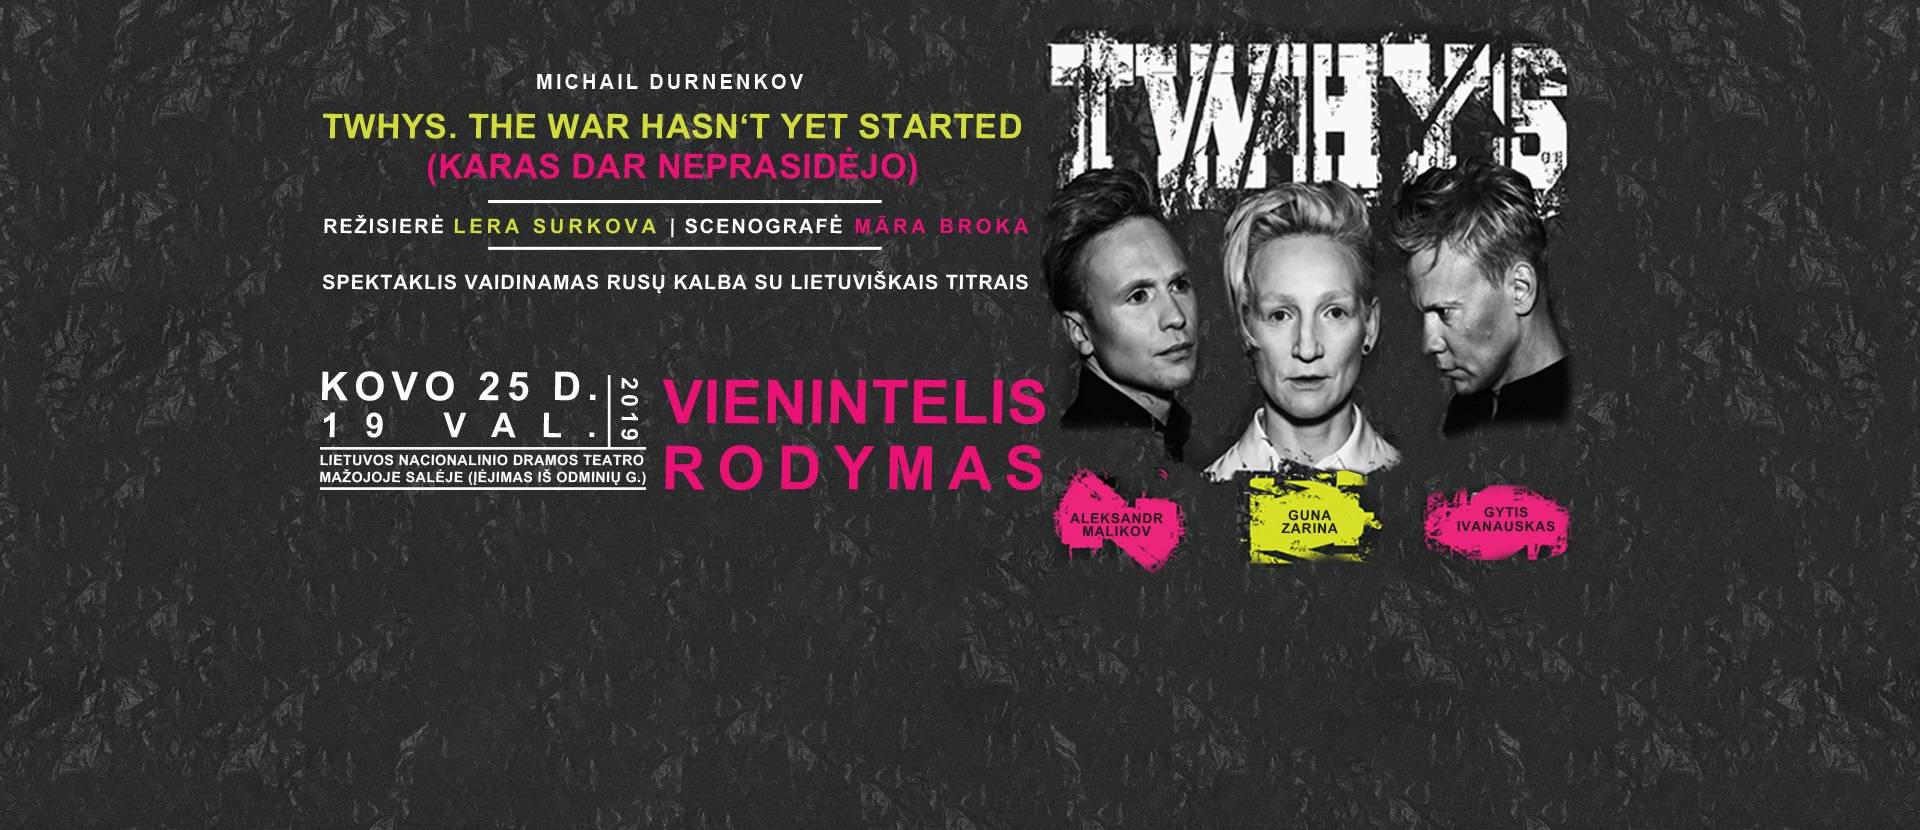 Michail Durnenkov  TWHYS. THE WAR HASN'T YET STARTED (KARAS DAR NEPRASIDĖJO), rež. Lera Surkova